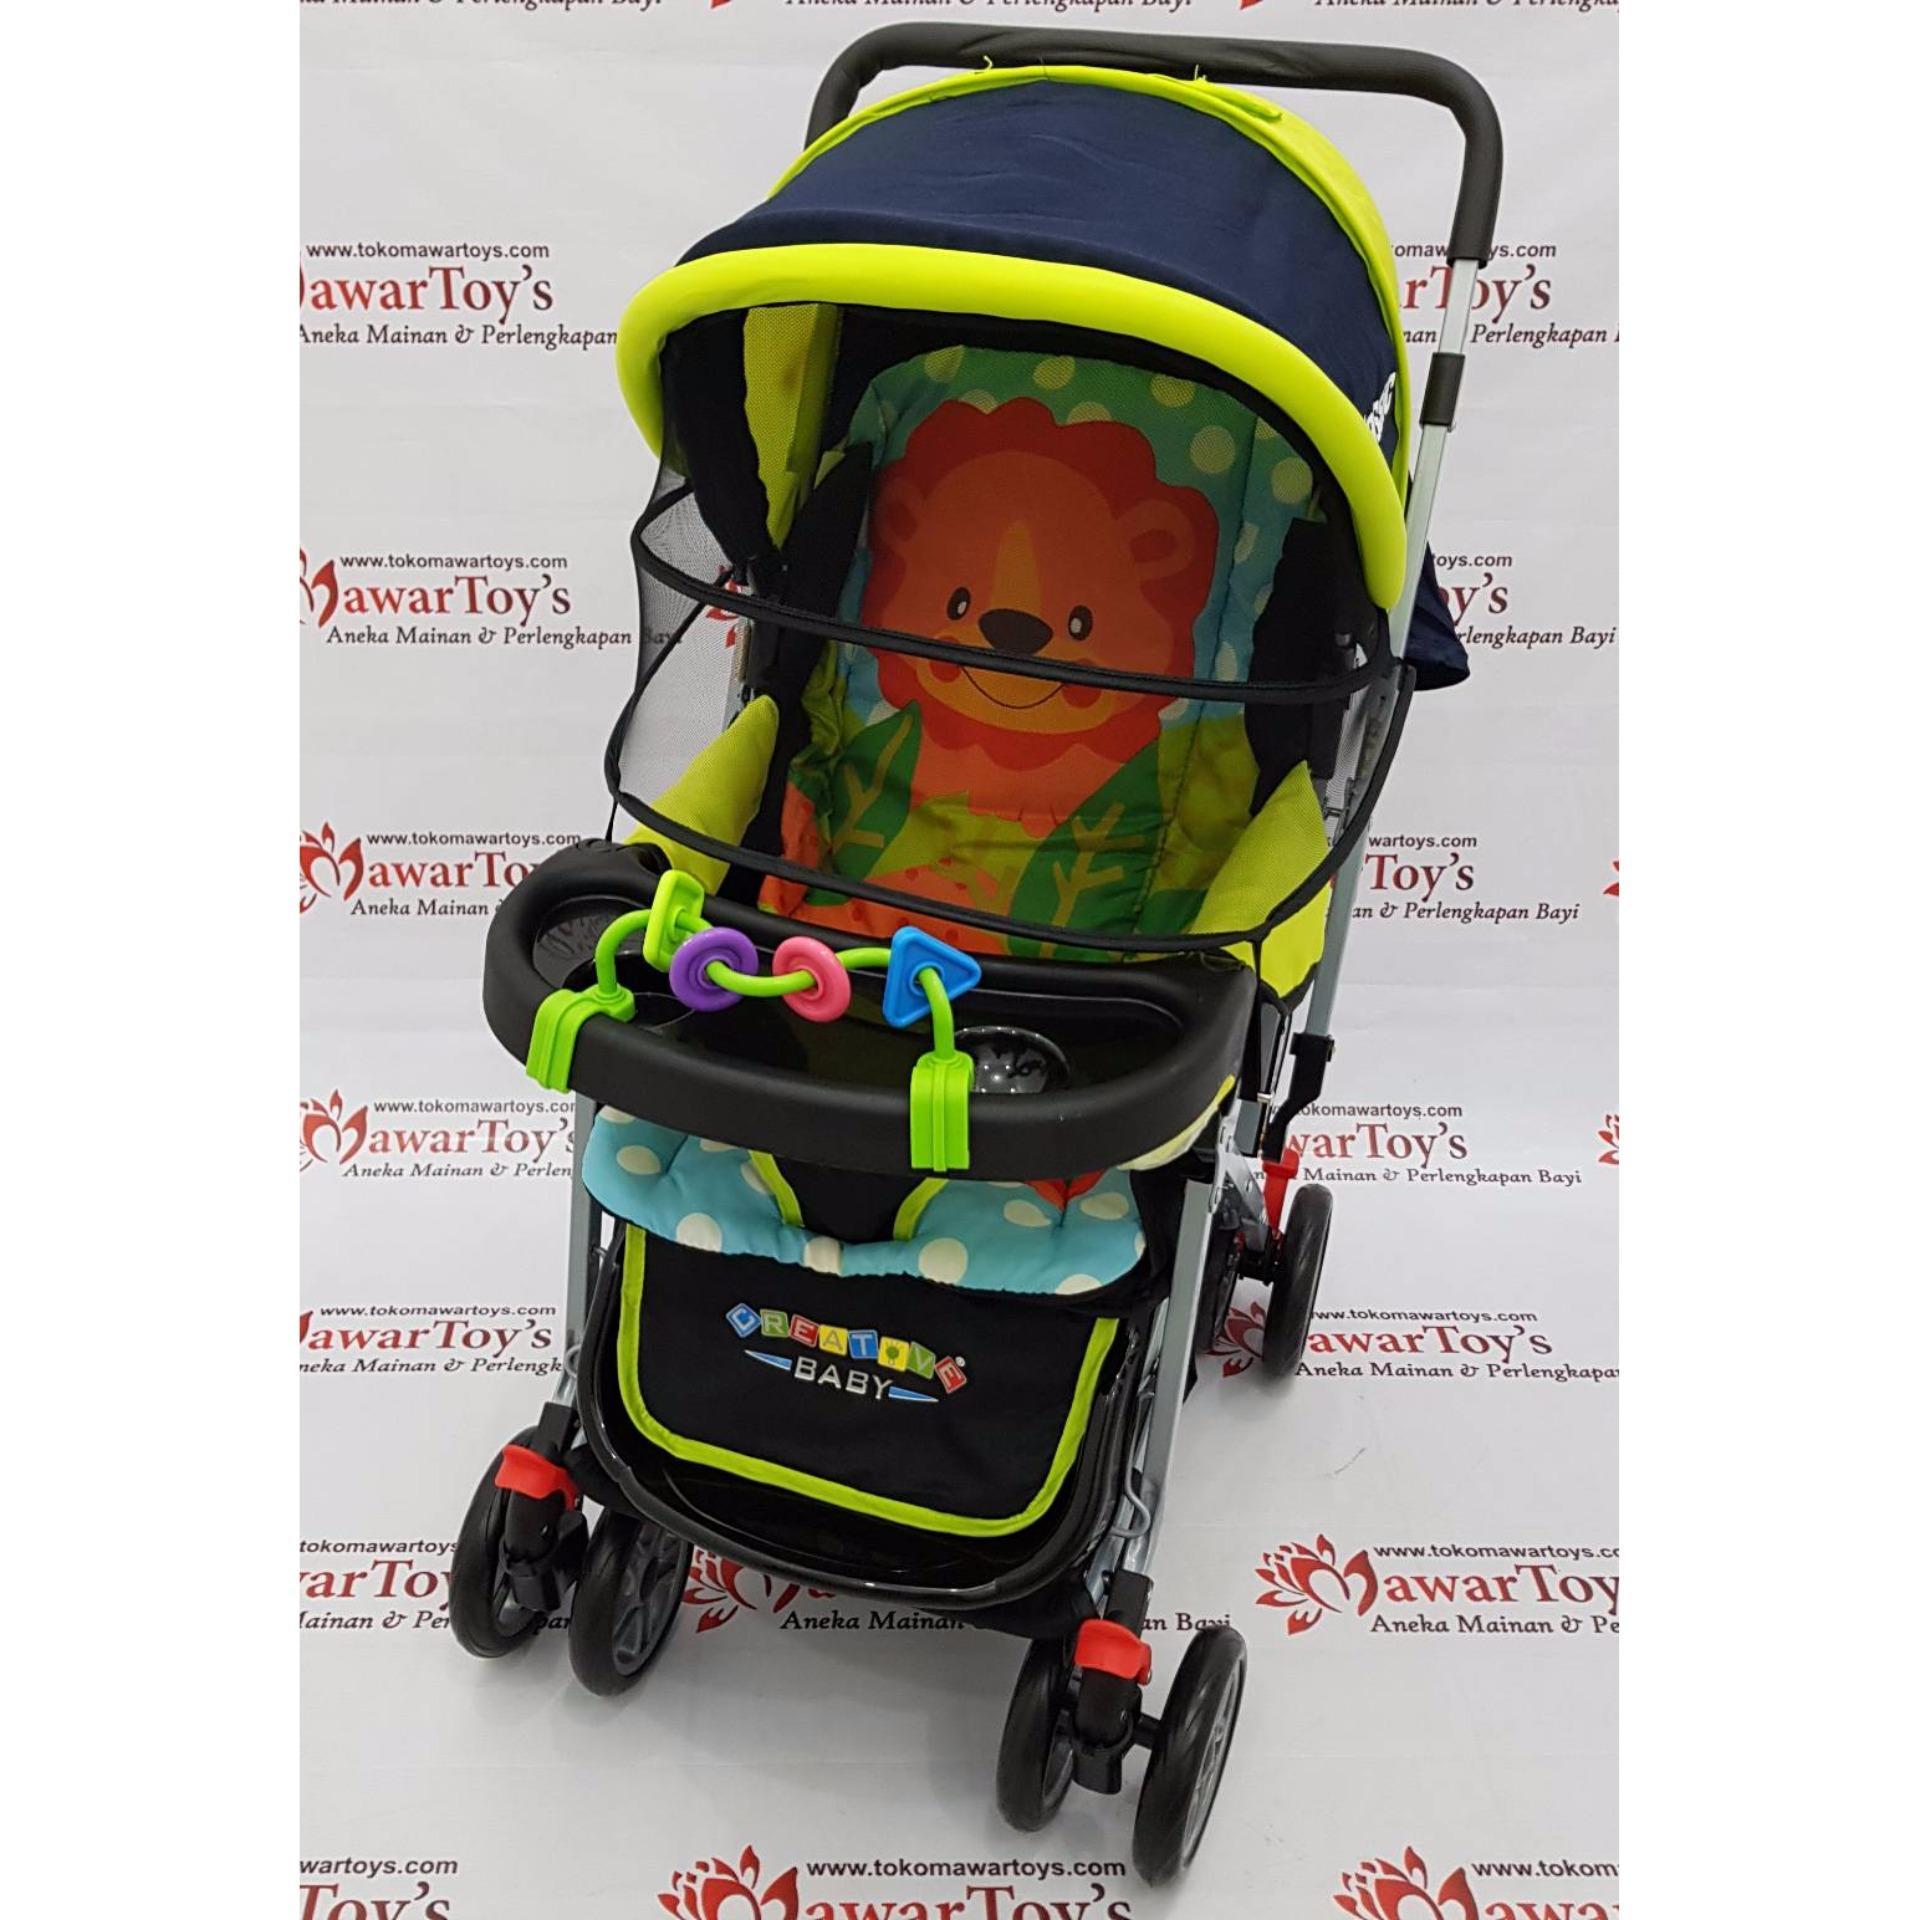 stroller pliko creative classic bs 218 (original) 1234 67618673 774032e531fd2e8ab0ec233304b8f1f0